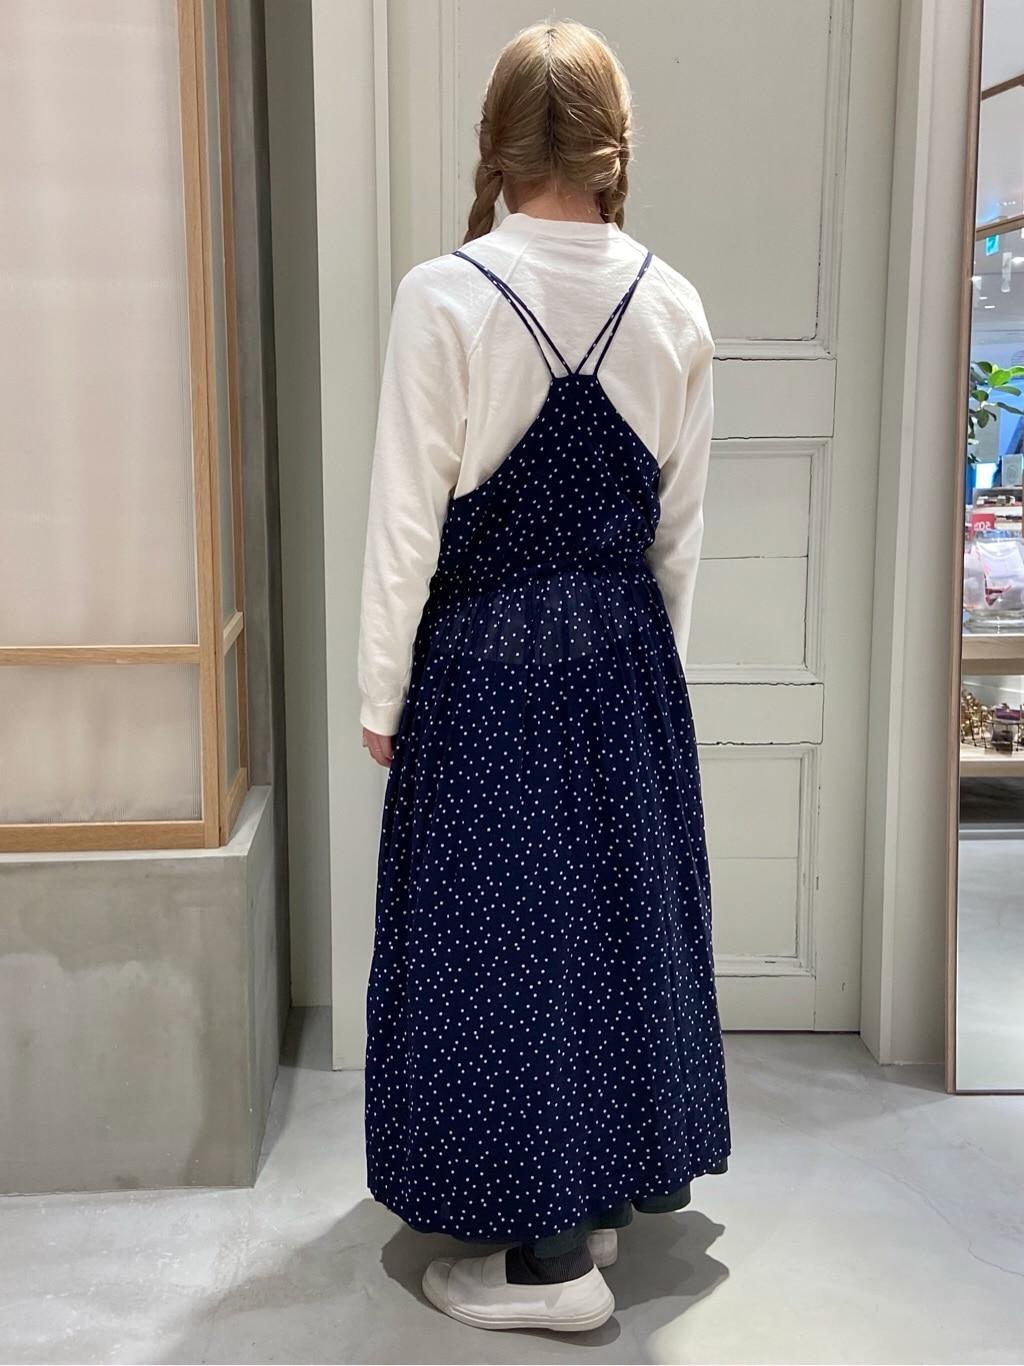 bulle de savon 渋谷スクランブルスクエア 身長:160cm 2021.01.15